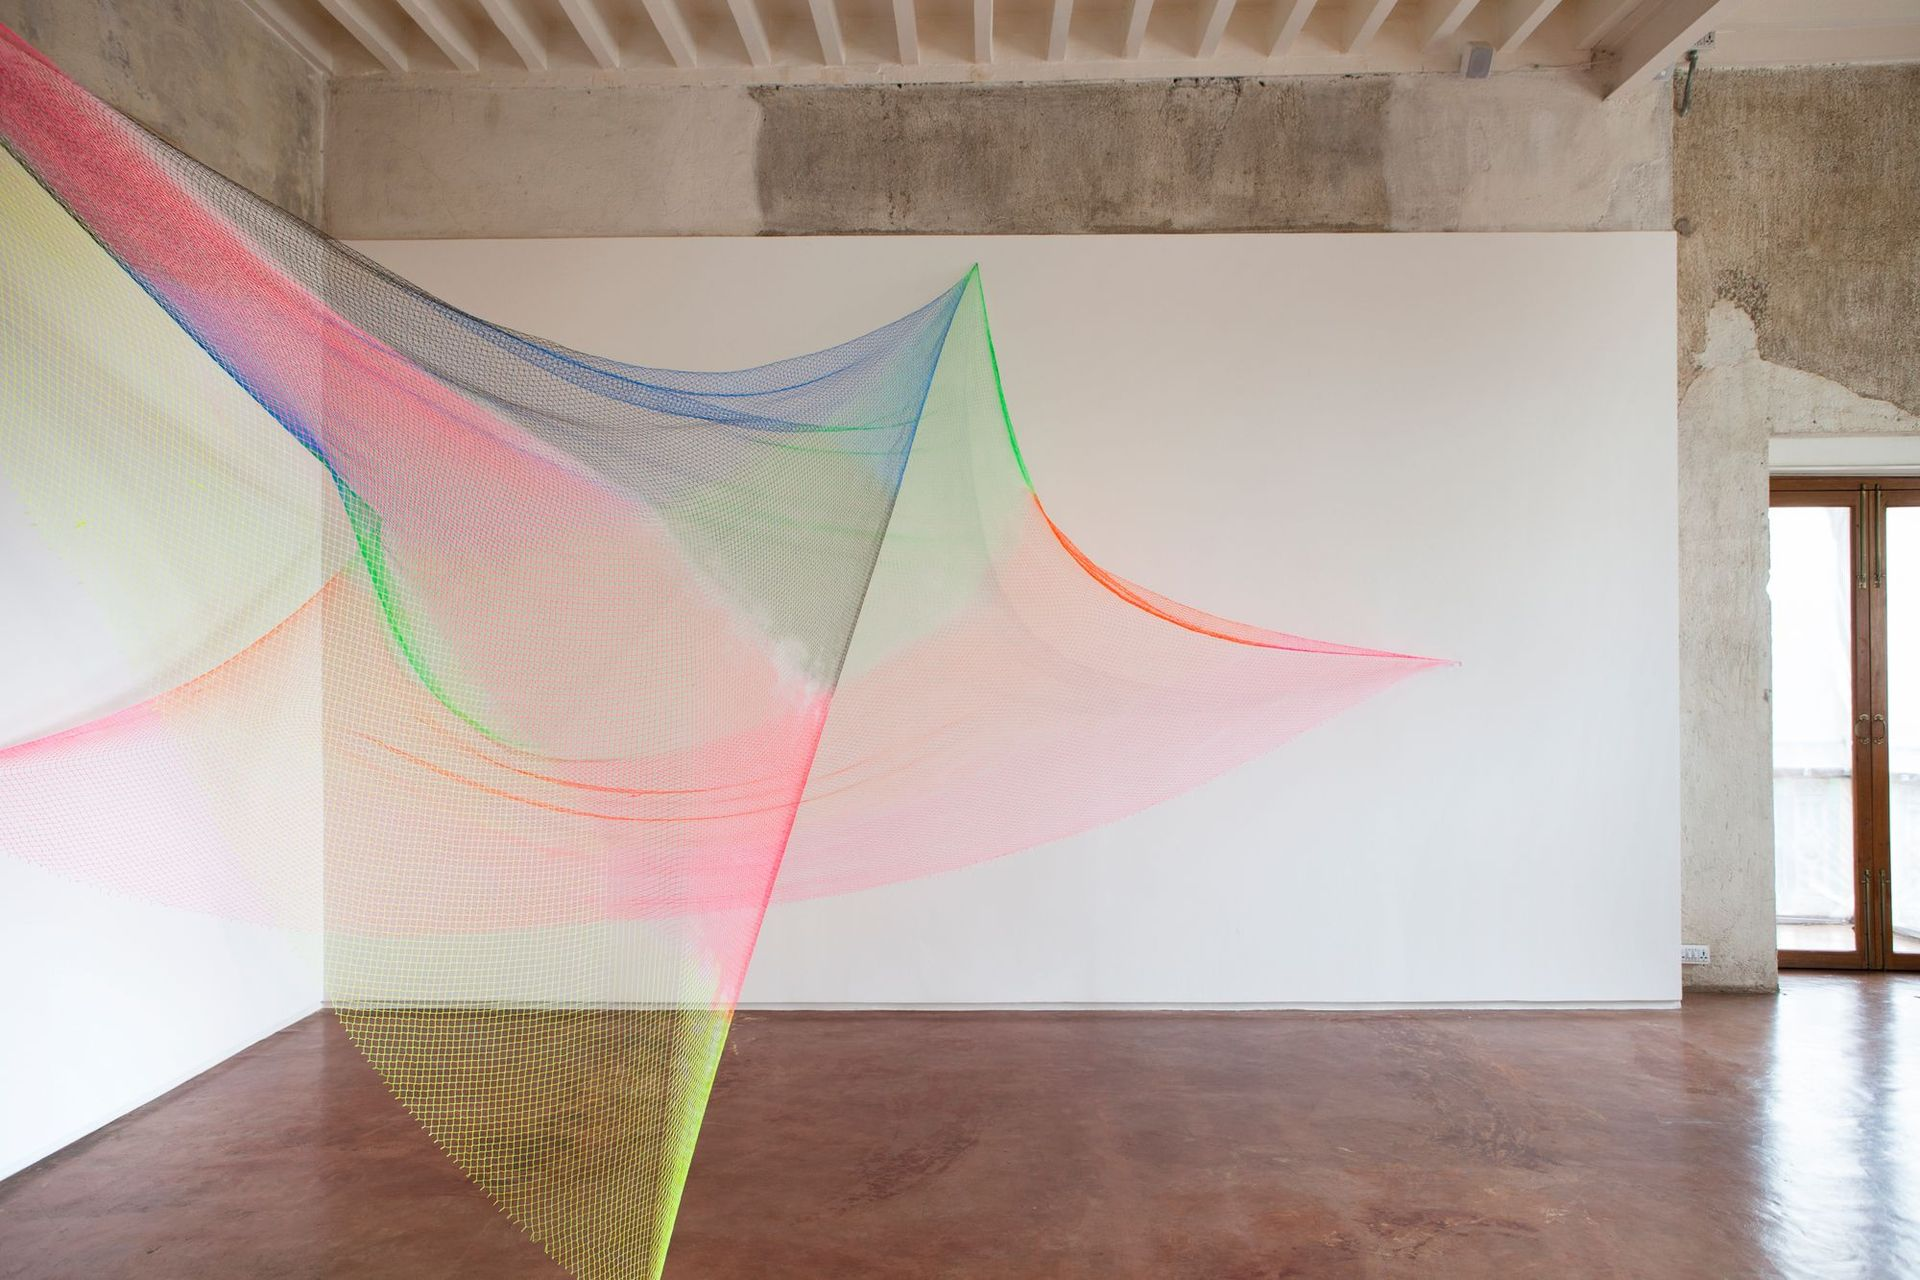 Gallery home- Rana Begum installation view 2019